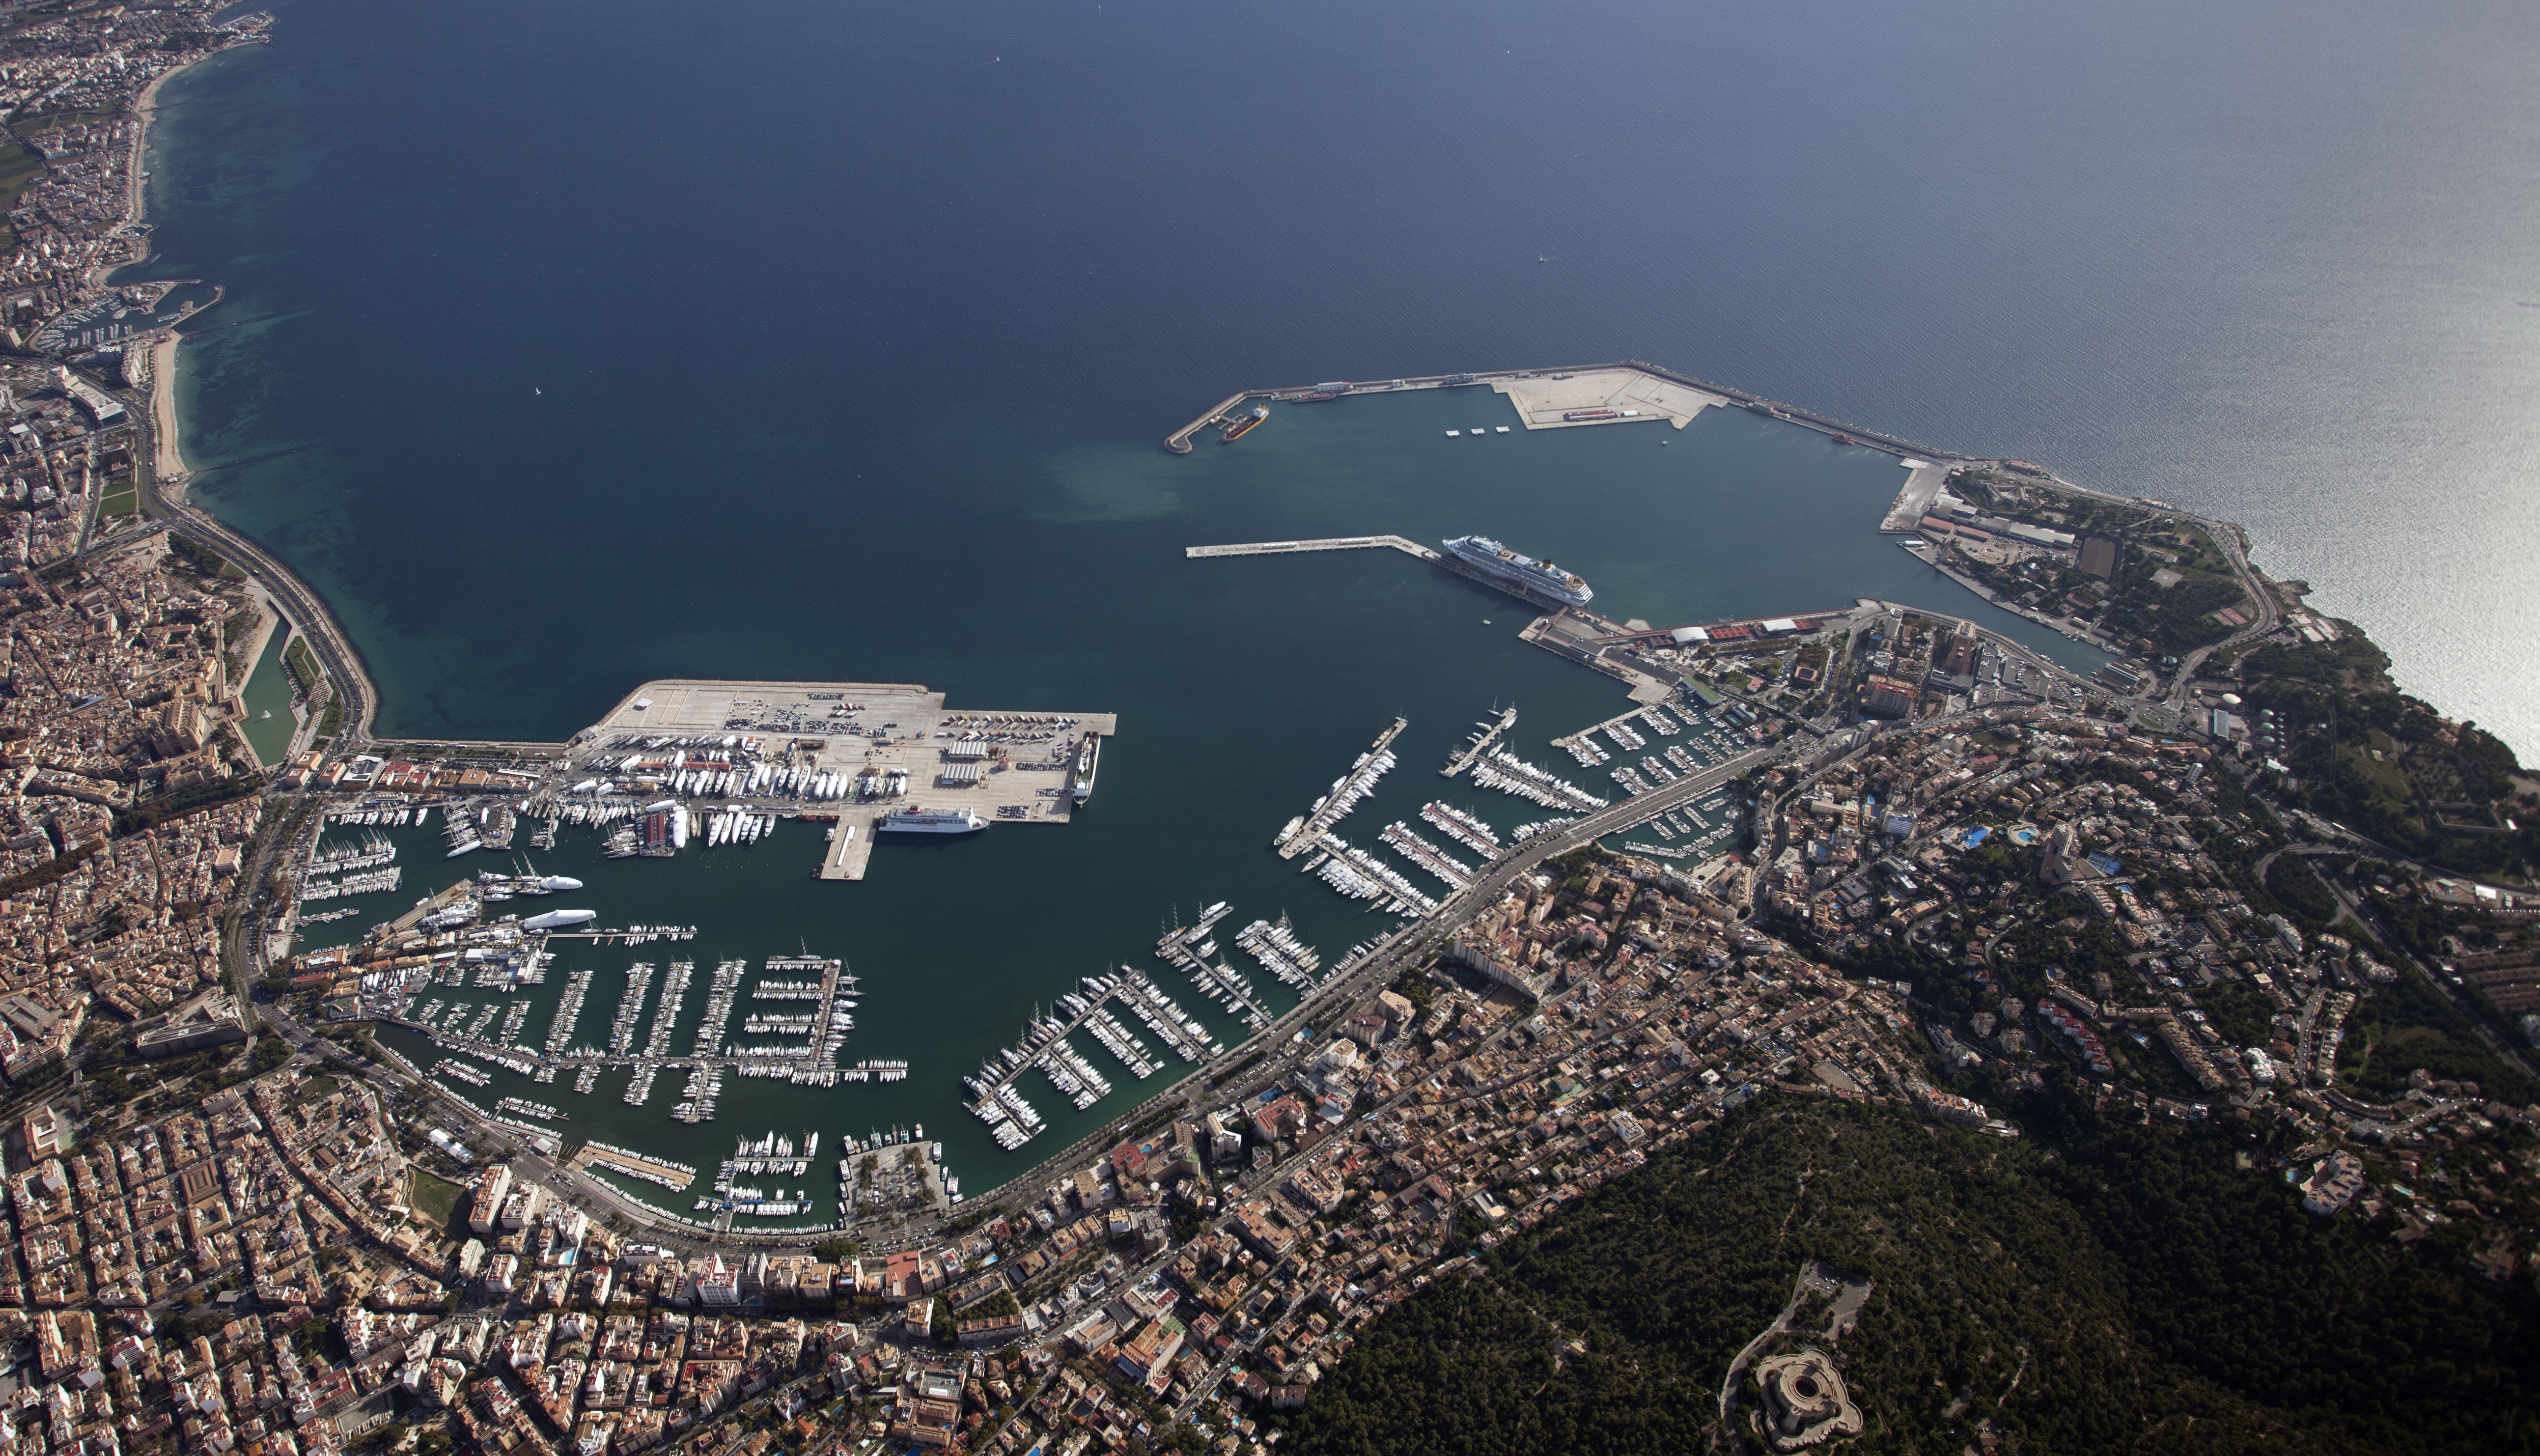 Vista aérea del puerto de Palma